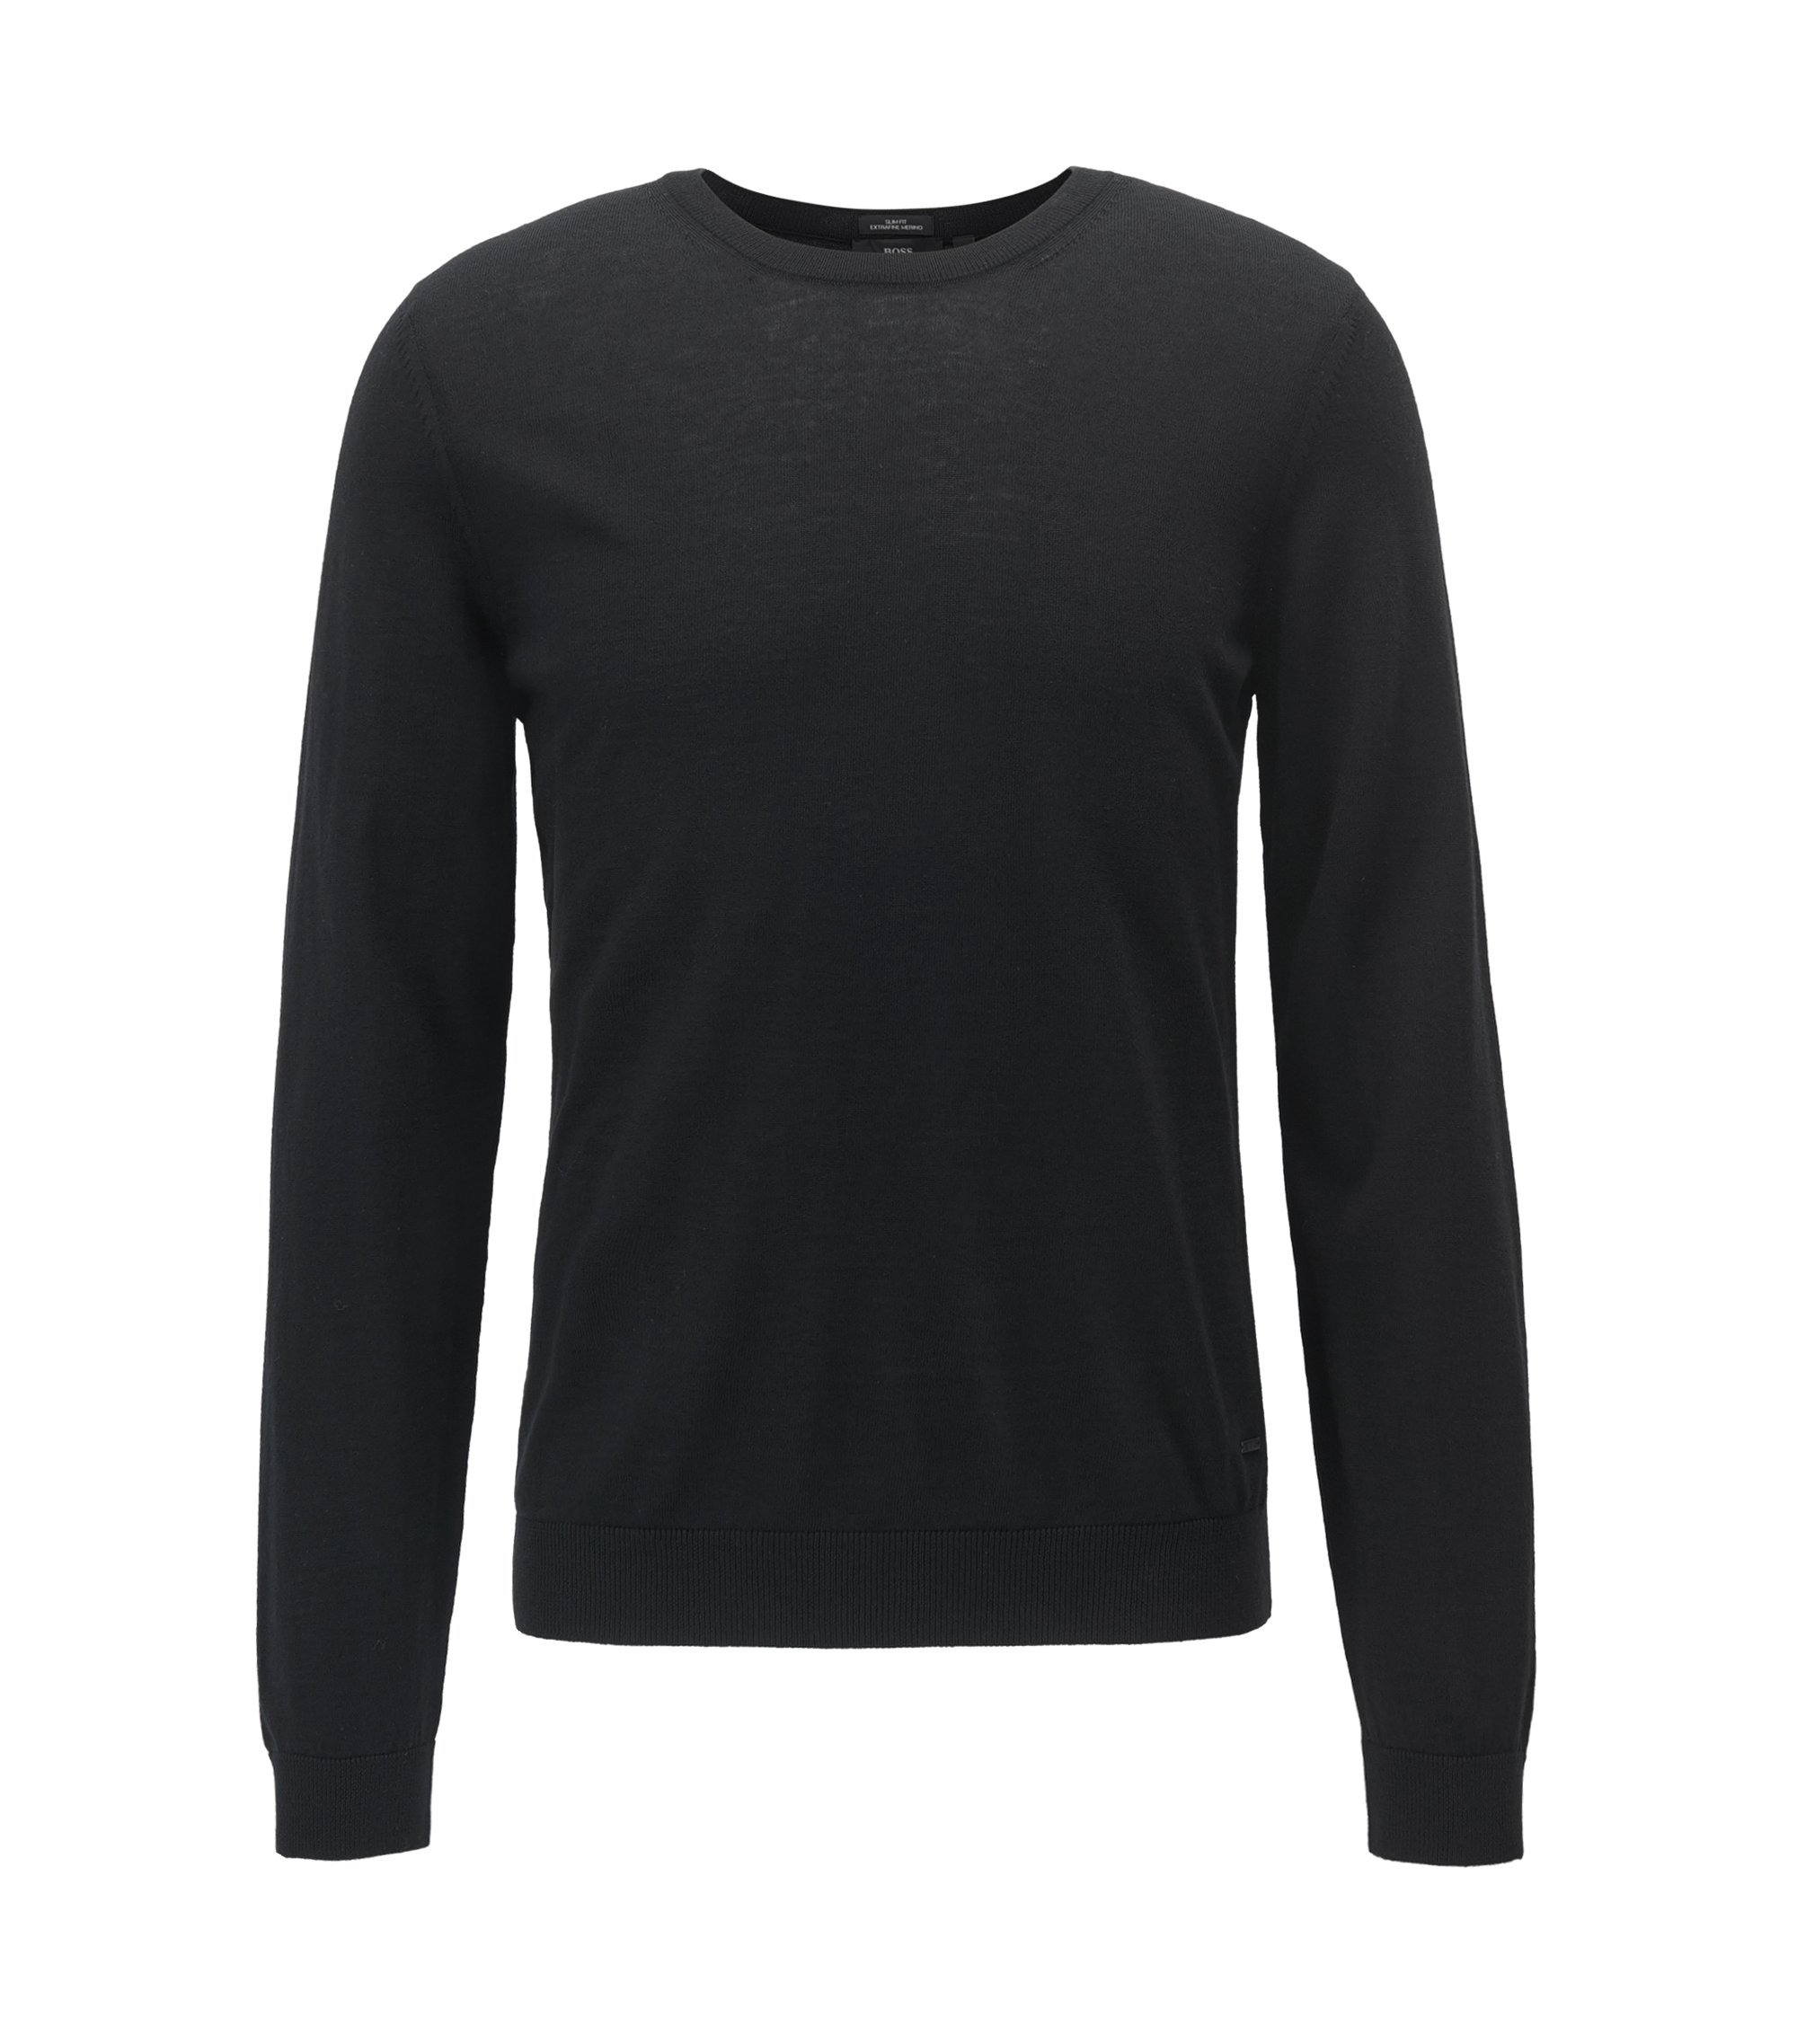 Jersey de cuello redondo en lana virgen, Negro